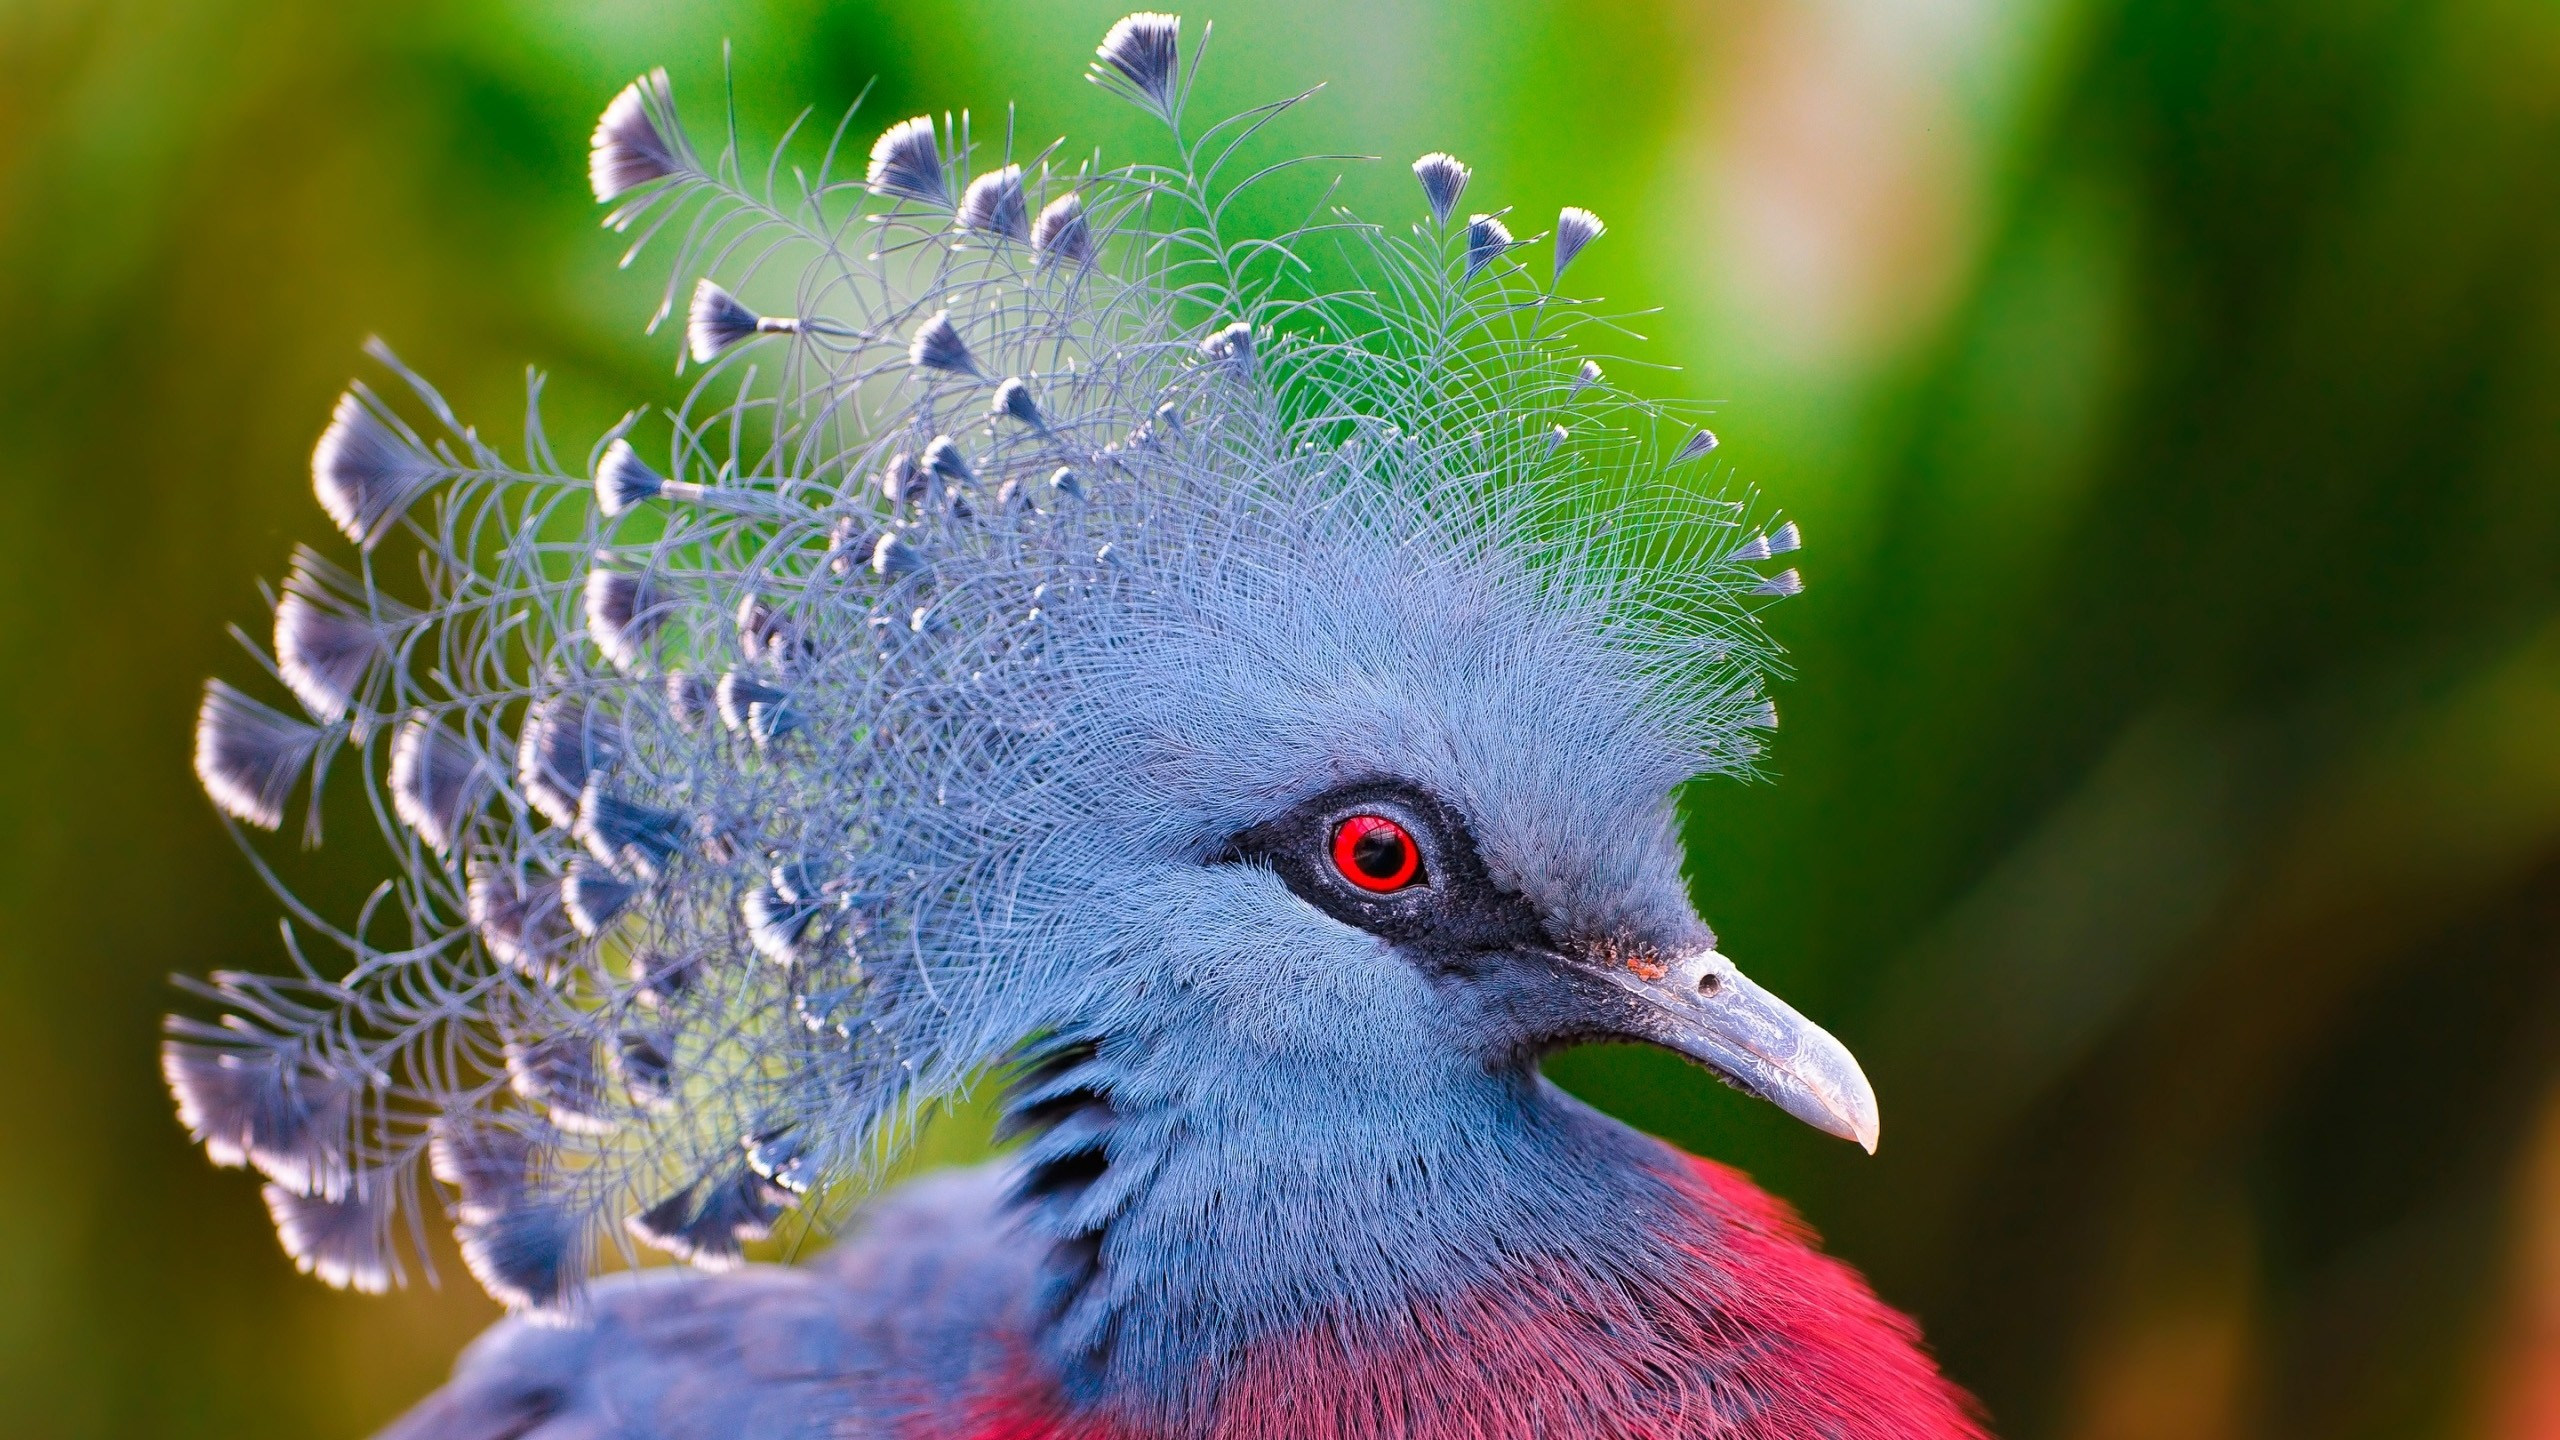 Parrots Paradise Birds Hd K Wallpapers Data Src Widescreen Birds Of Paradise Hd 2560x1440 Wallpaper Teahub Io